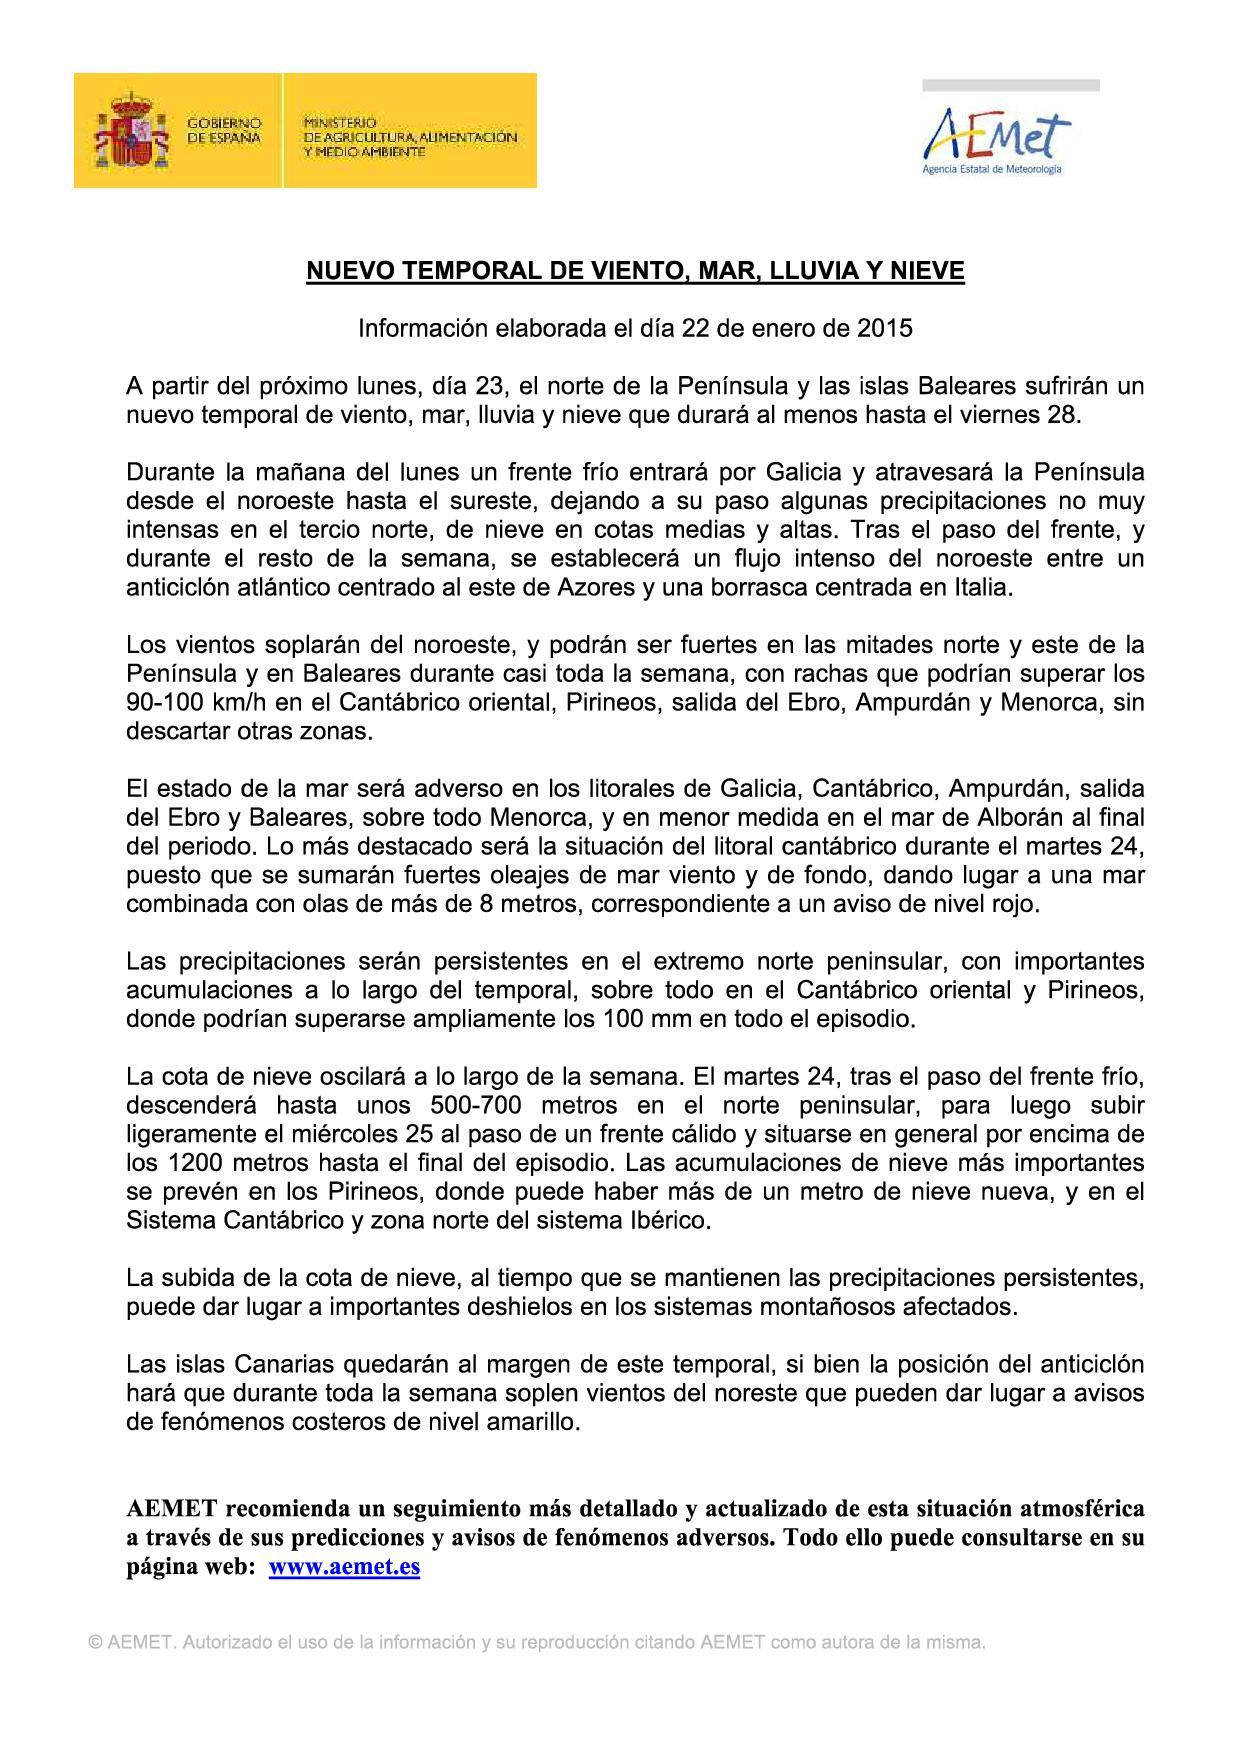 www.aemet.es_documentos_d_enportada_p53tesp1